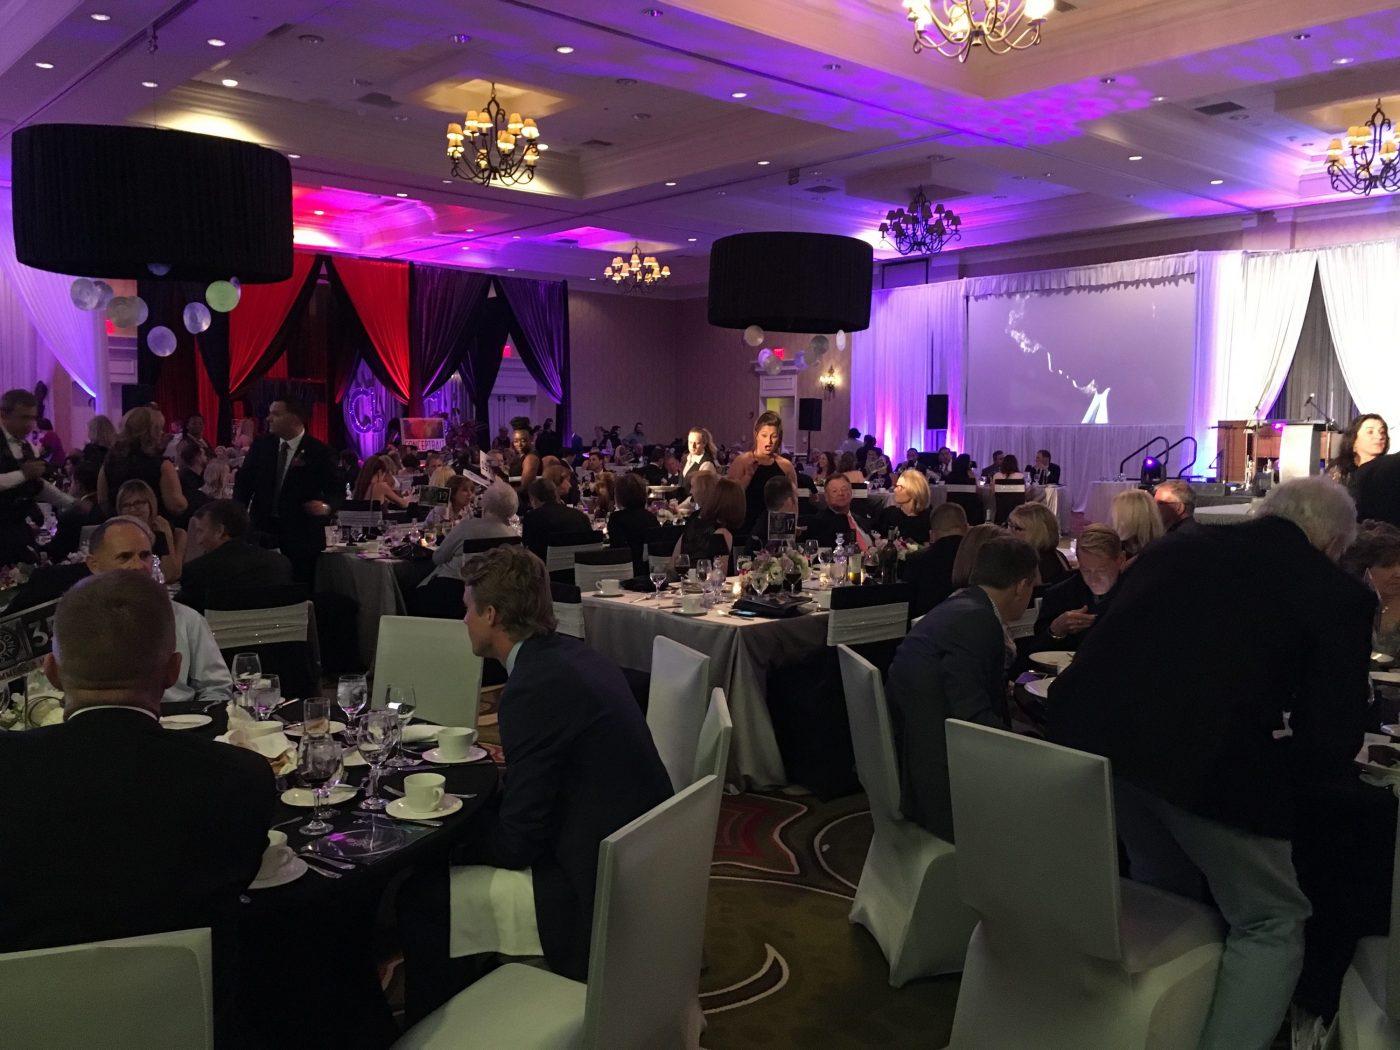 Habitat for Humanity Gala 2018